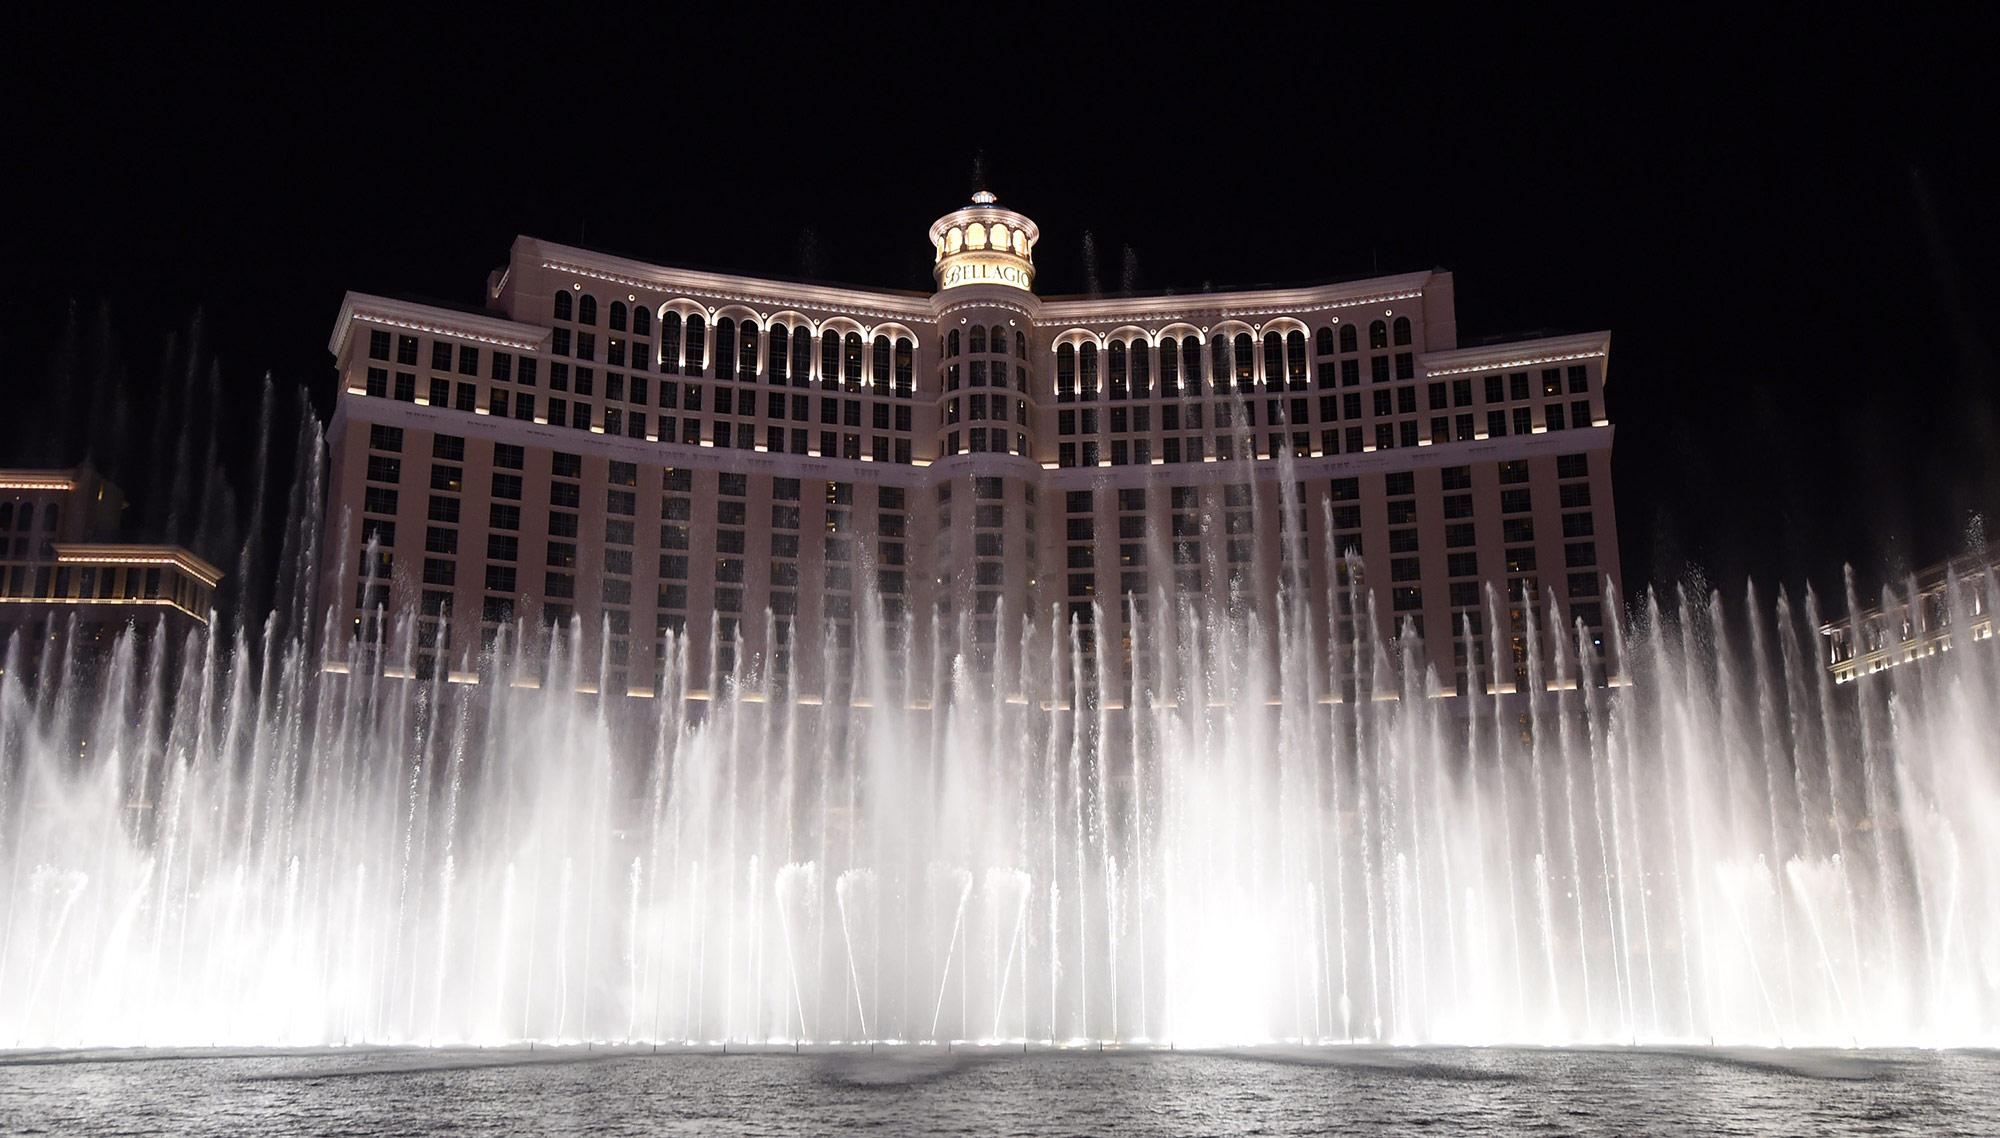 """Bellagio Fountains"" (Image Credit: multivu.com)"